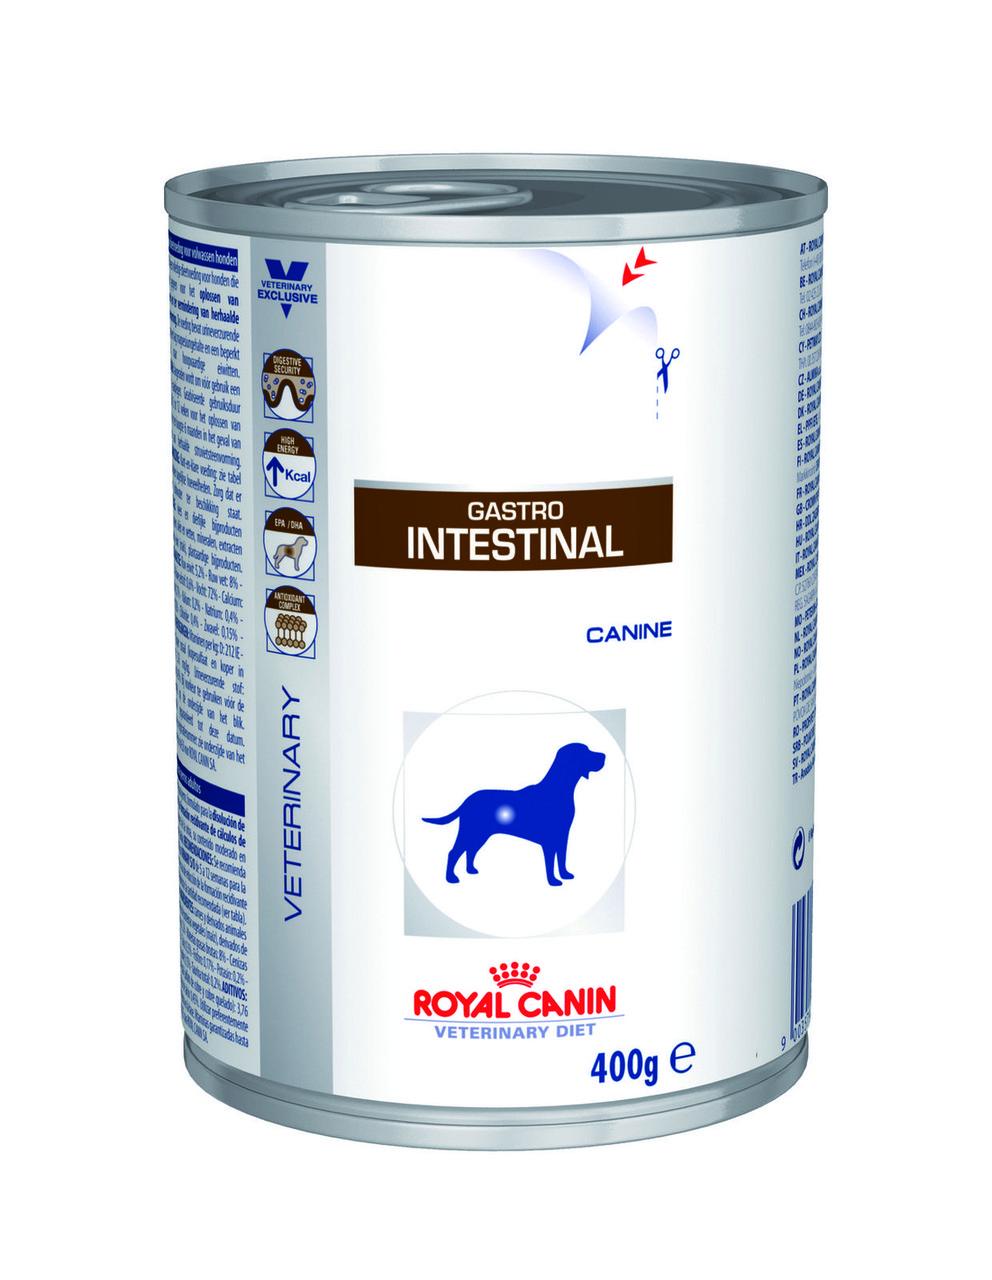 Royal Canin Gastro Intestinal Wet влажный